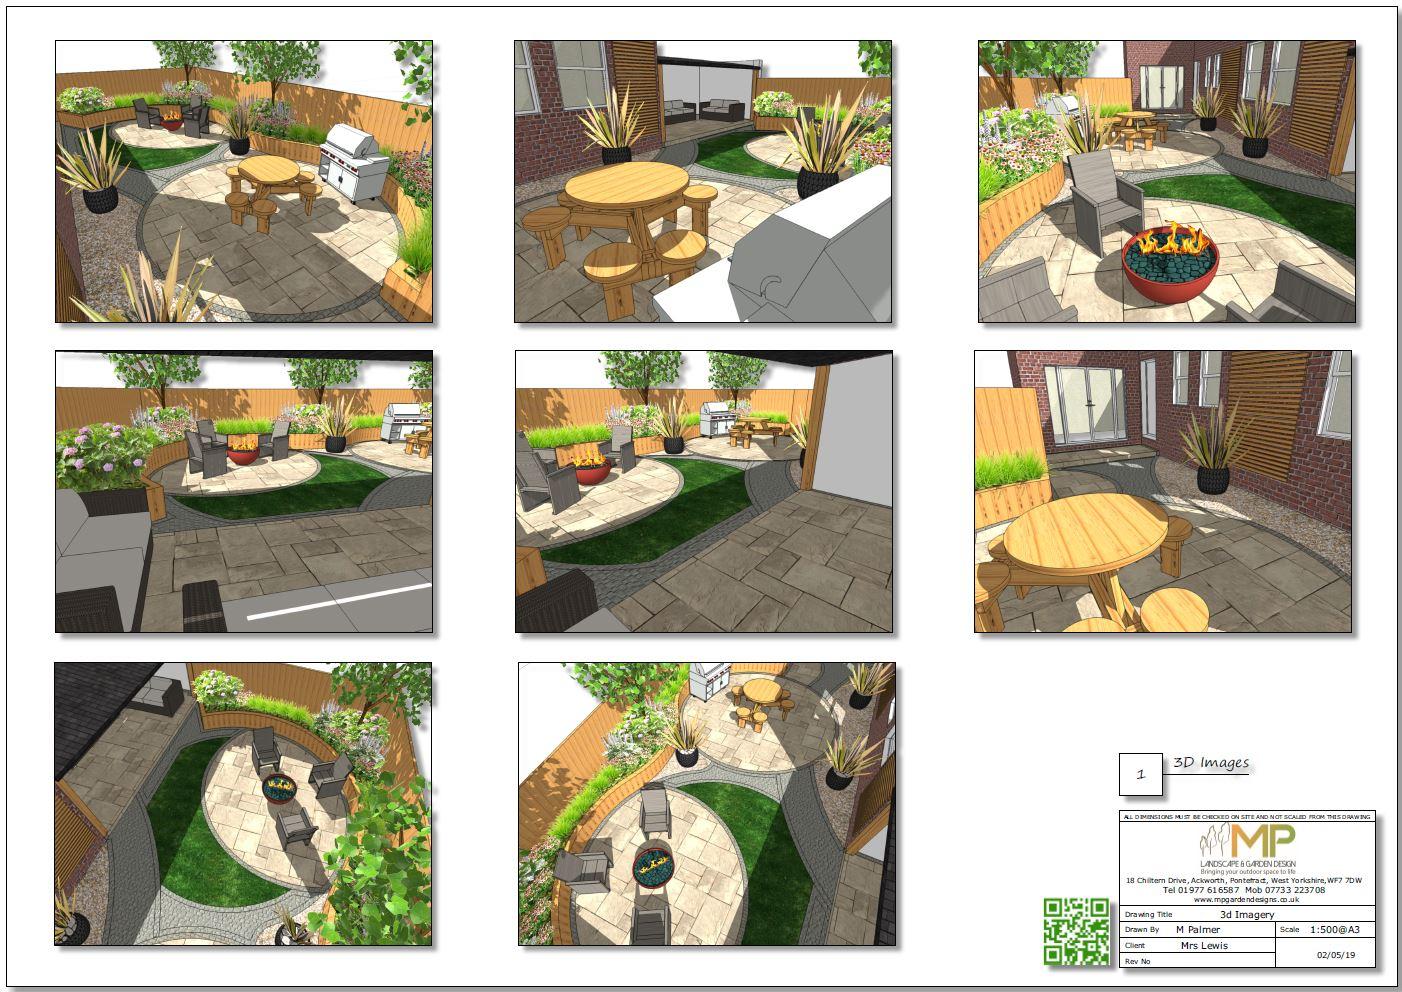 3, Garden layout plans-3D images, Castleford.